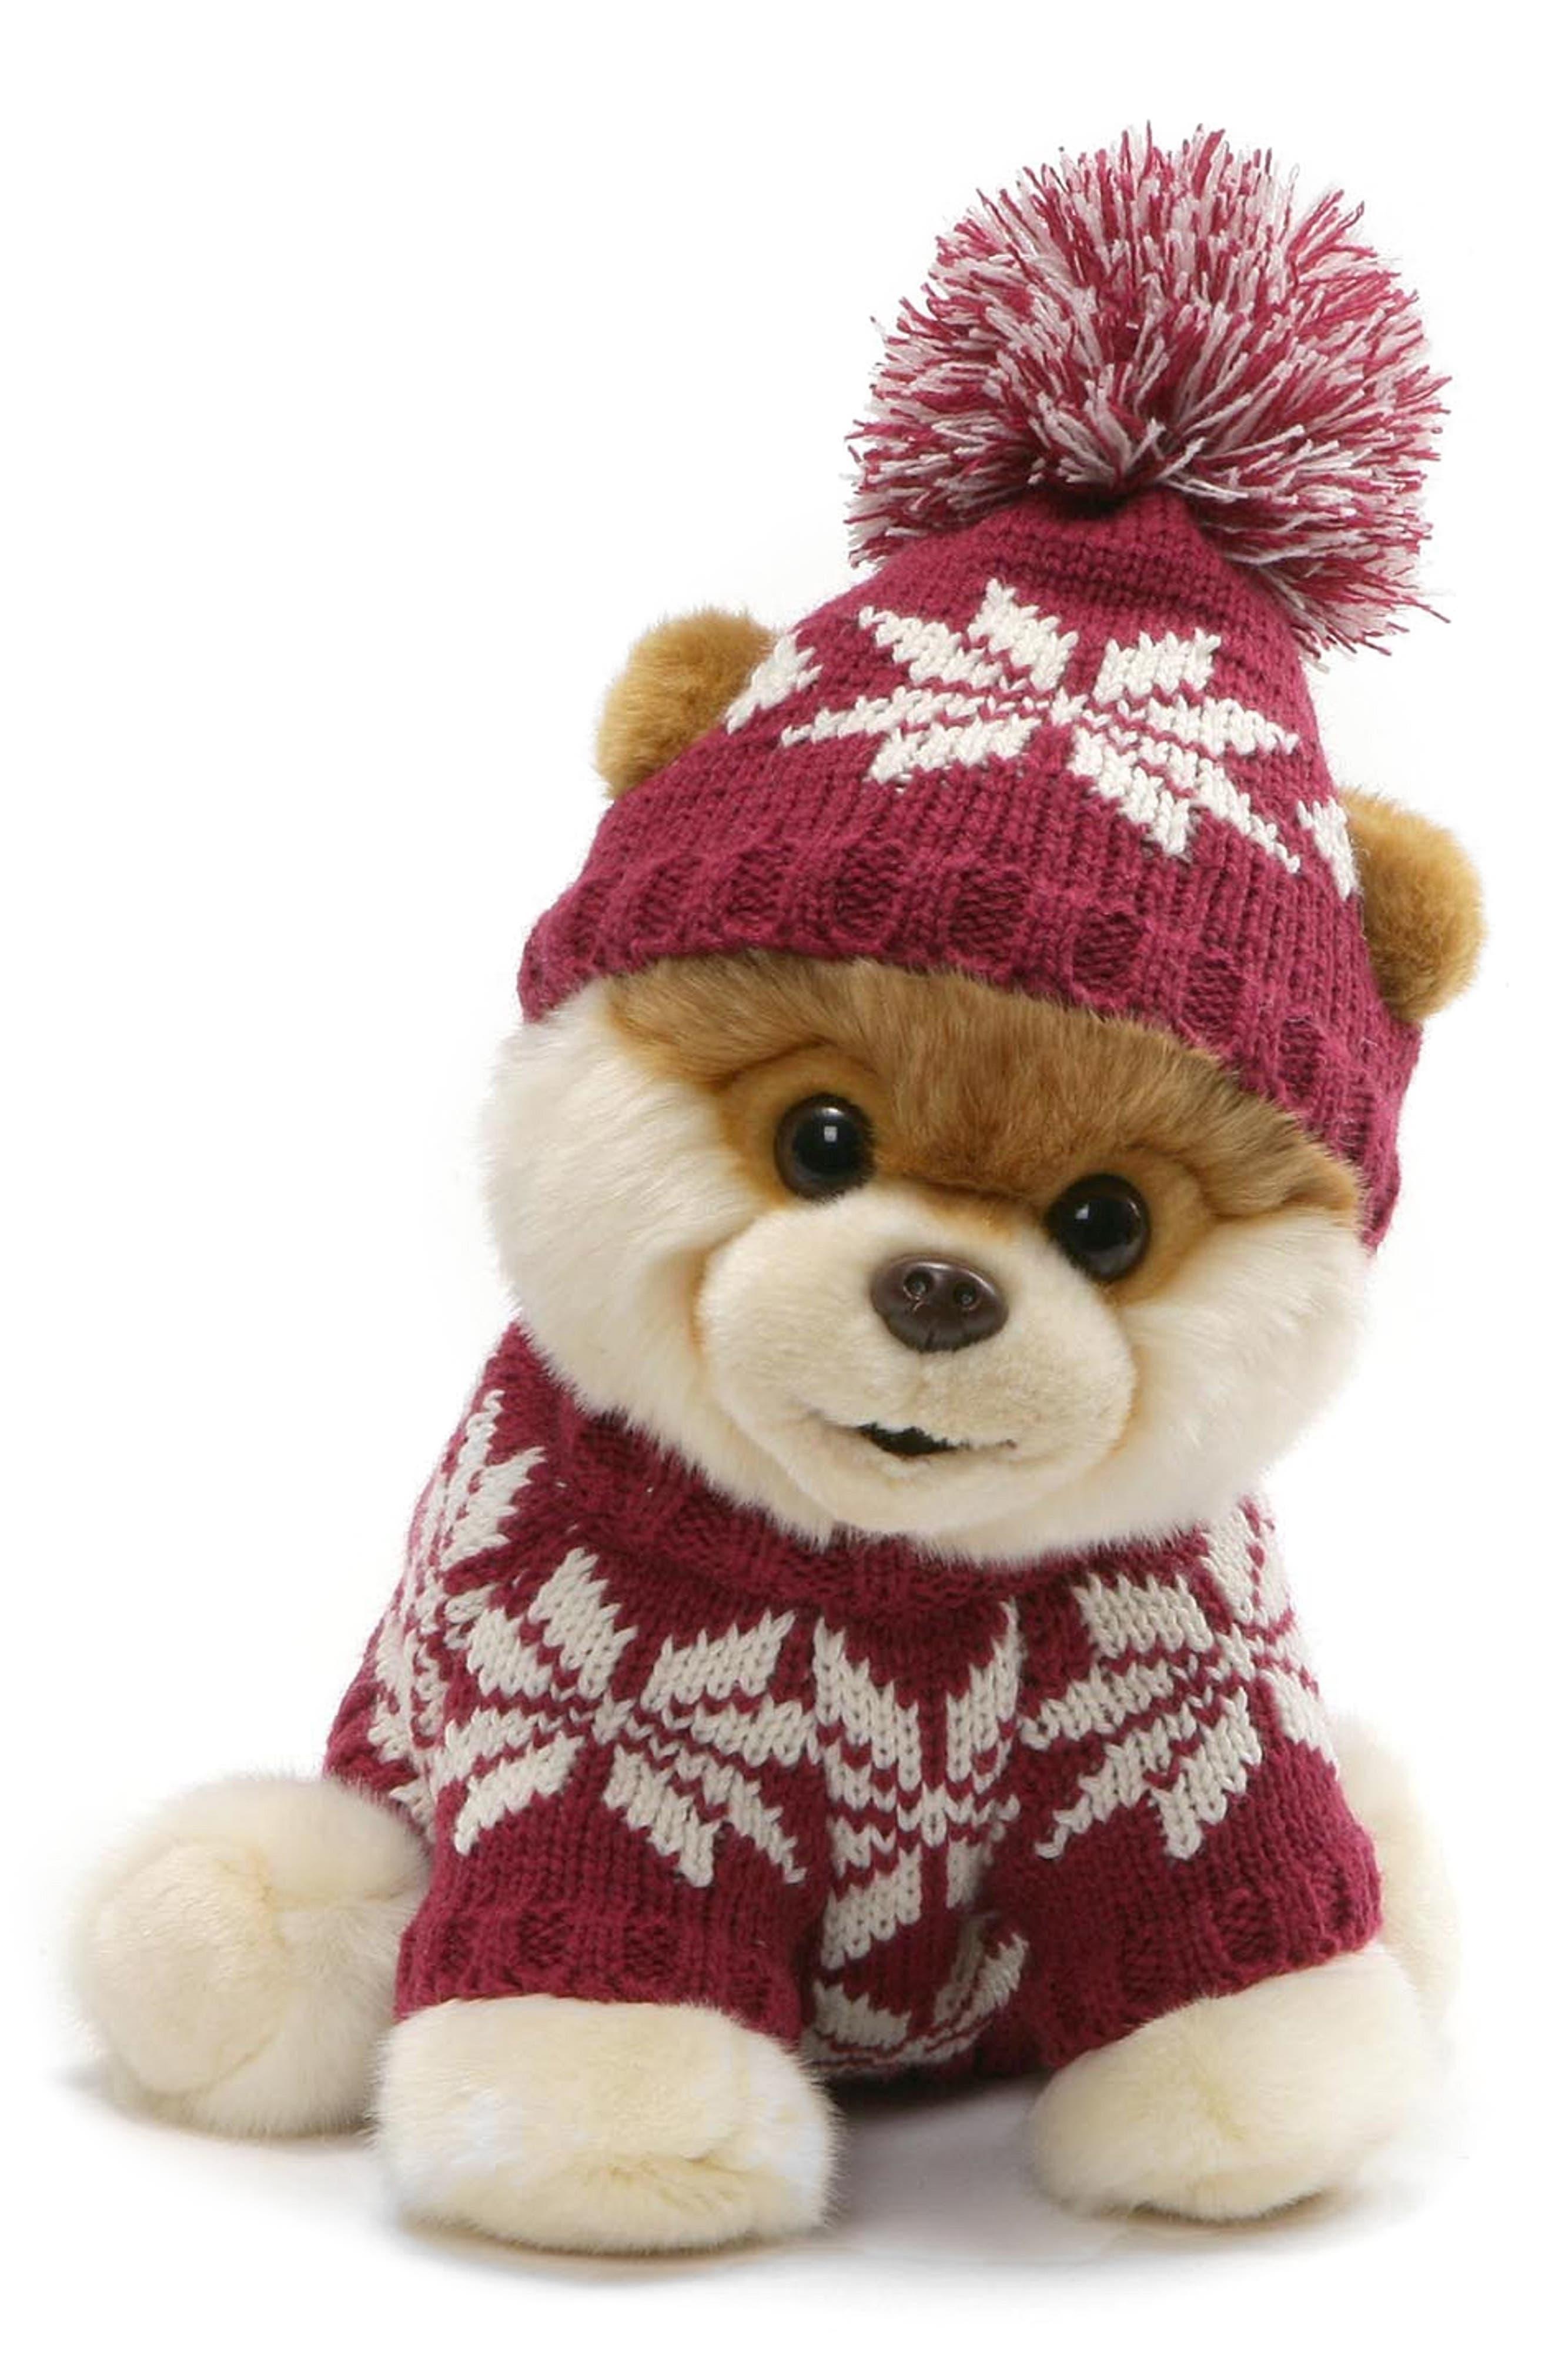 Boo - Fair Isle Sweater Stuffed Animal,                             Main thumbnail 1, color,                             TAN